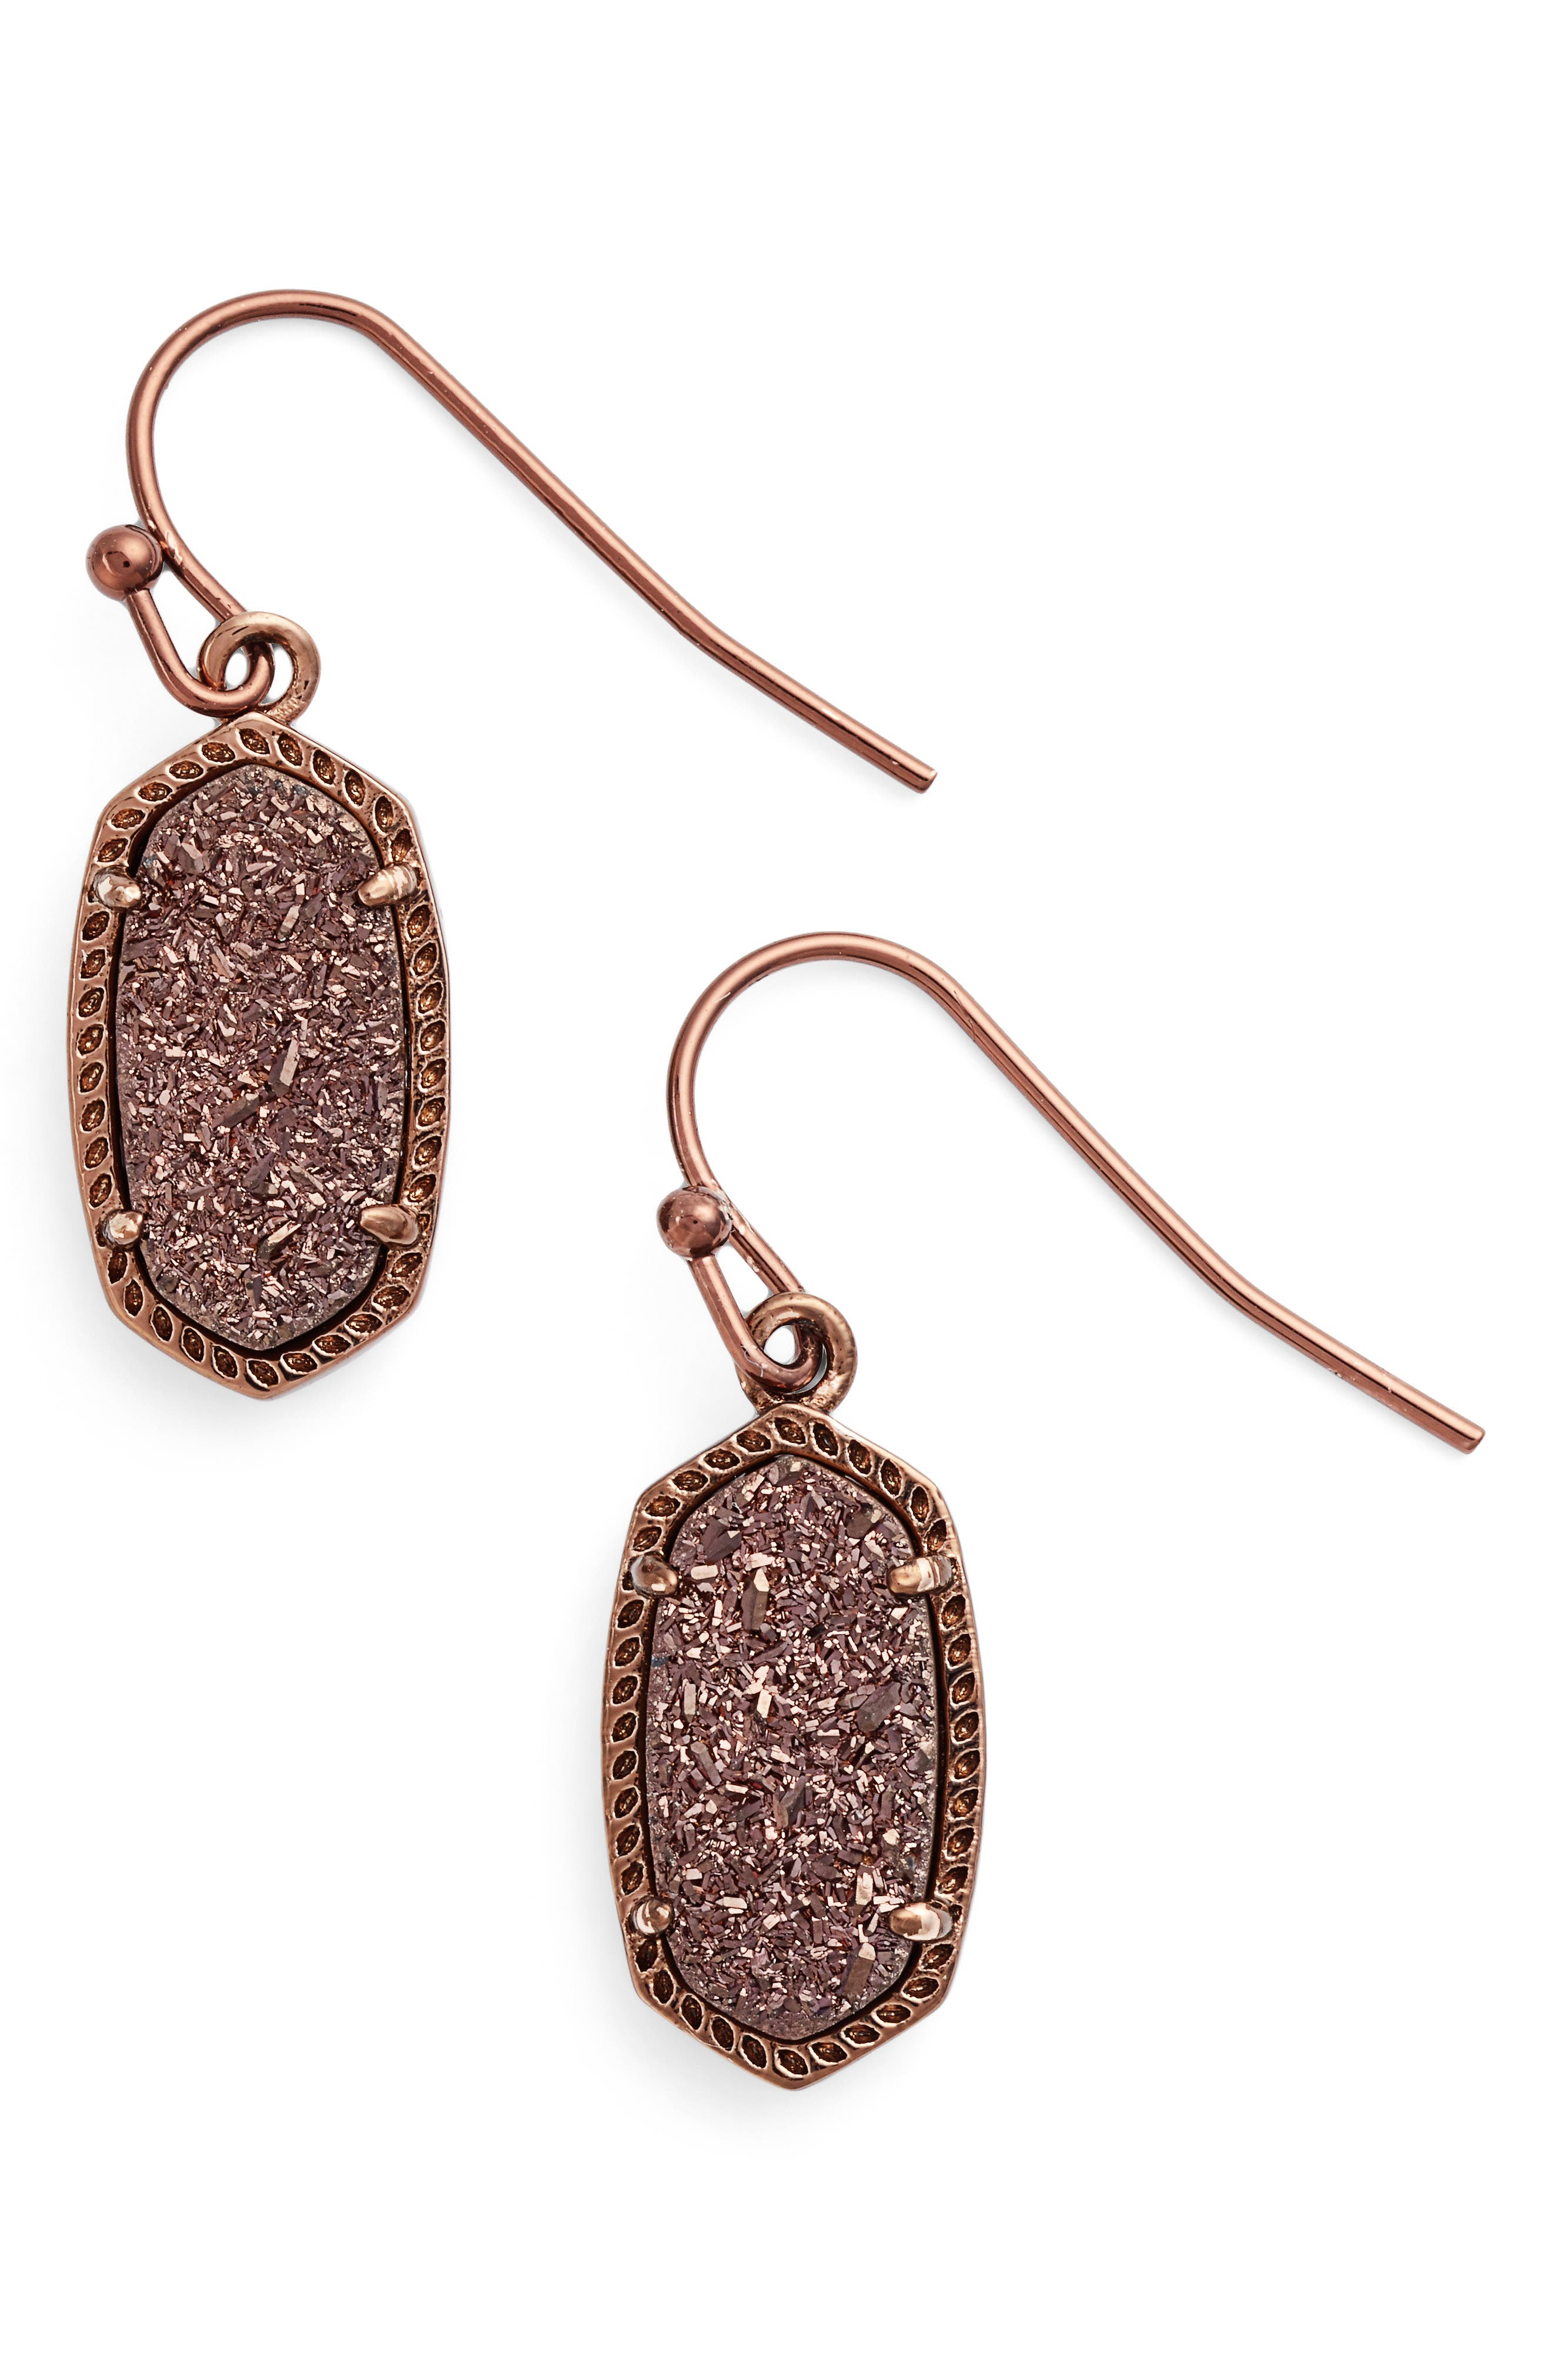 Alternate Image 1 Selected - Kendra Scott 'Lee' Small Drop Earrings